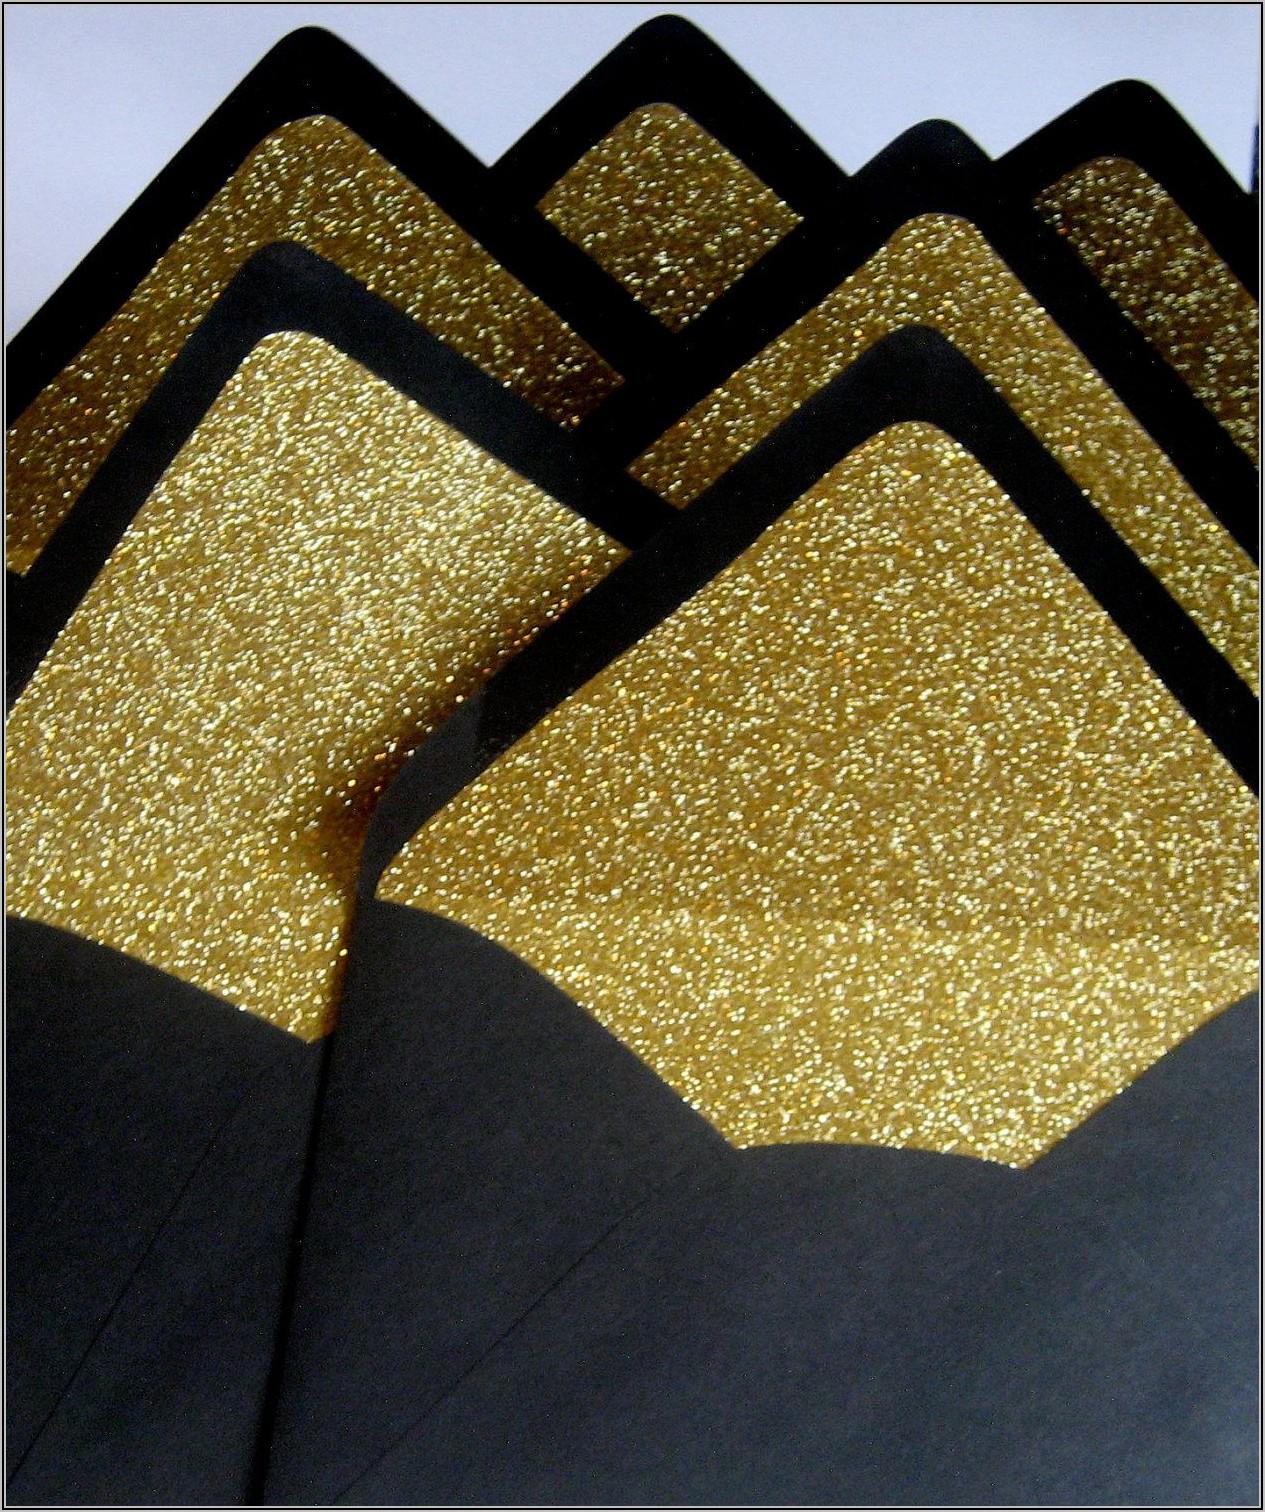 Black And Gold Lined Envelopes